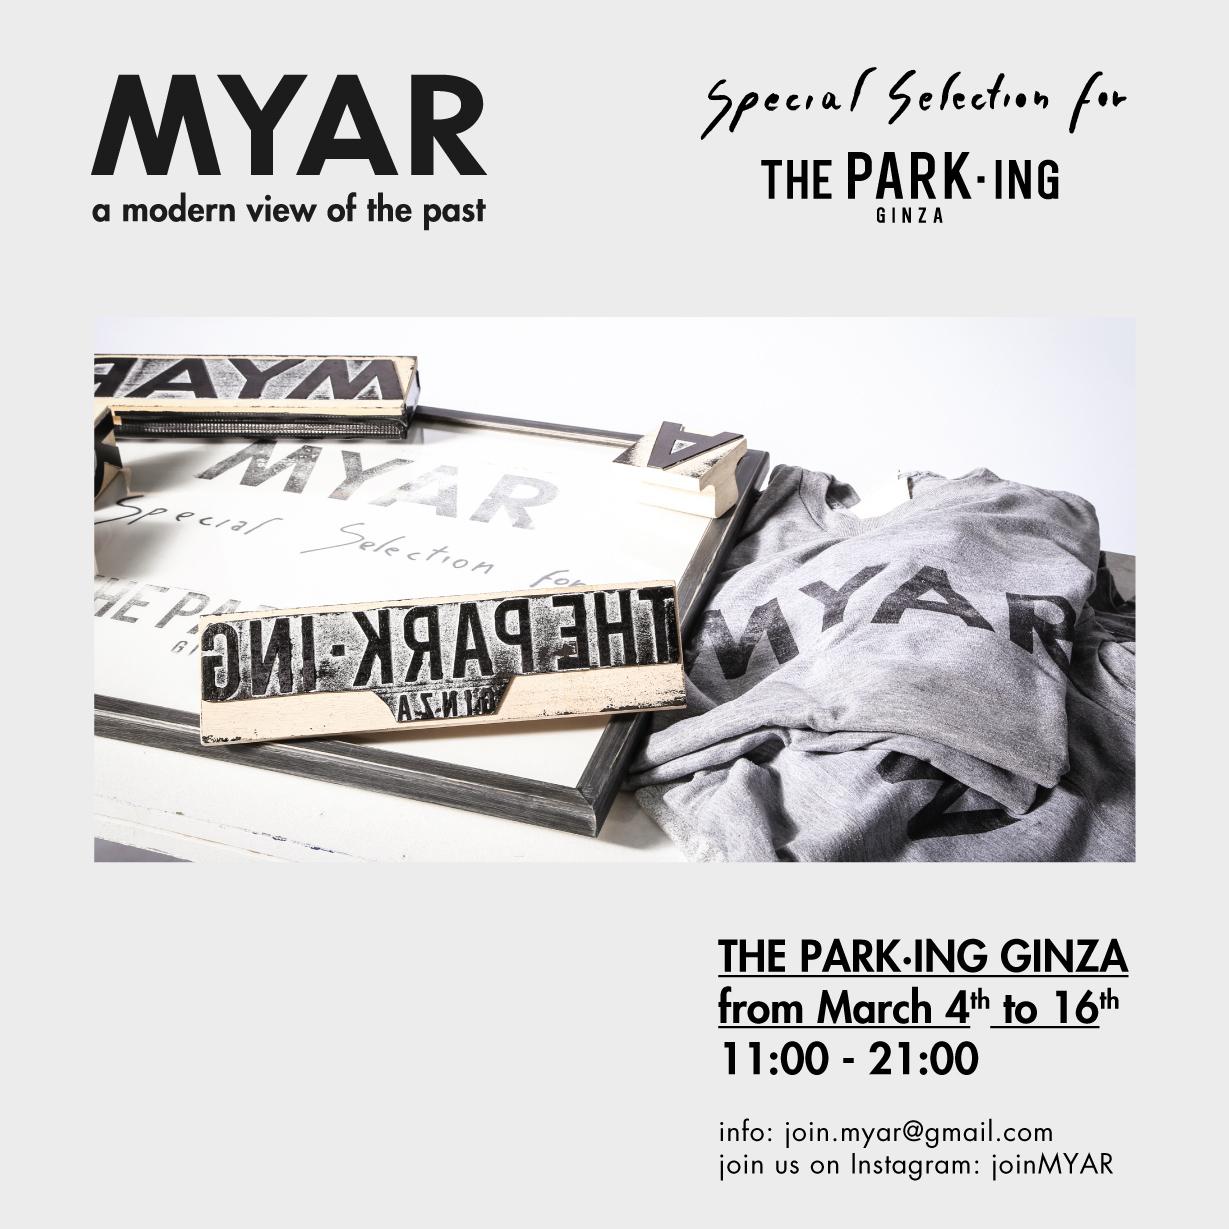 MYAR_INVITO_THE_PARK-ING_PRESS_280217.jpg